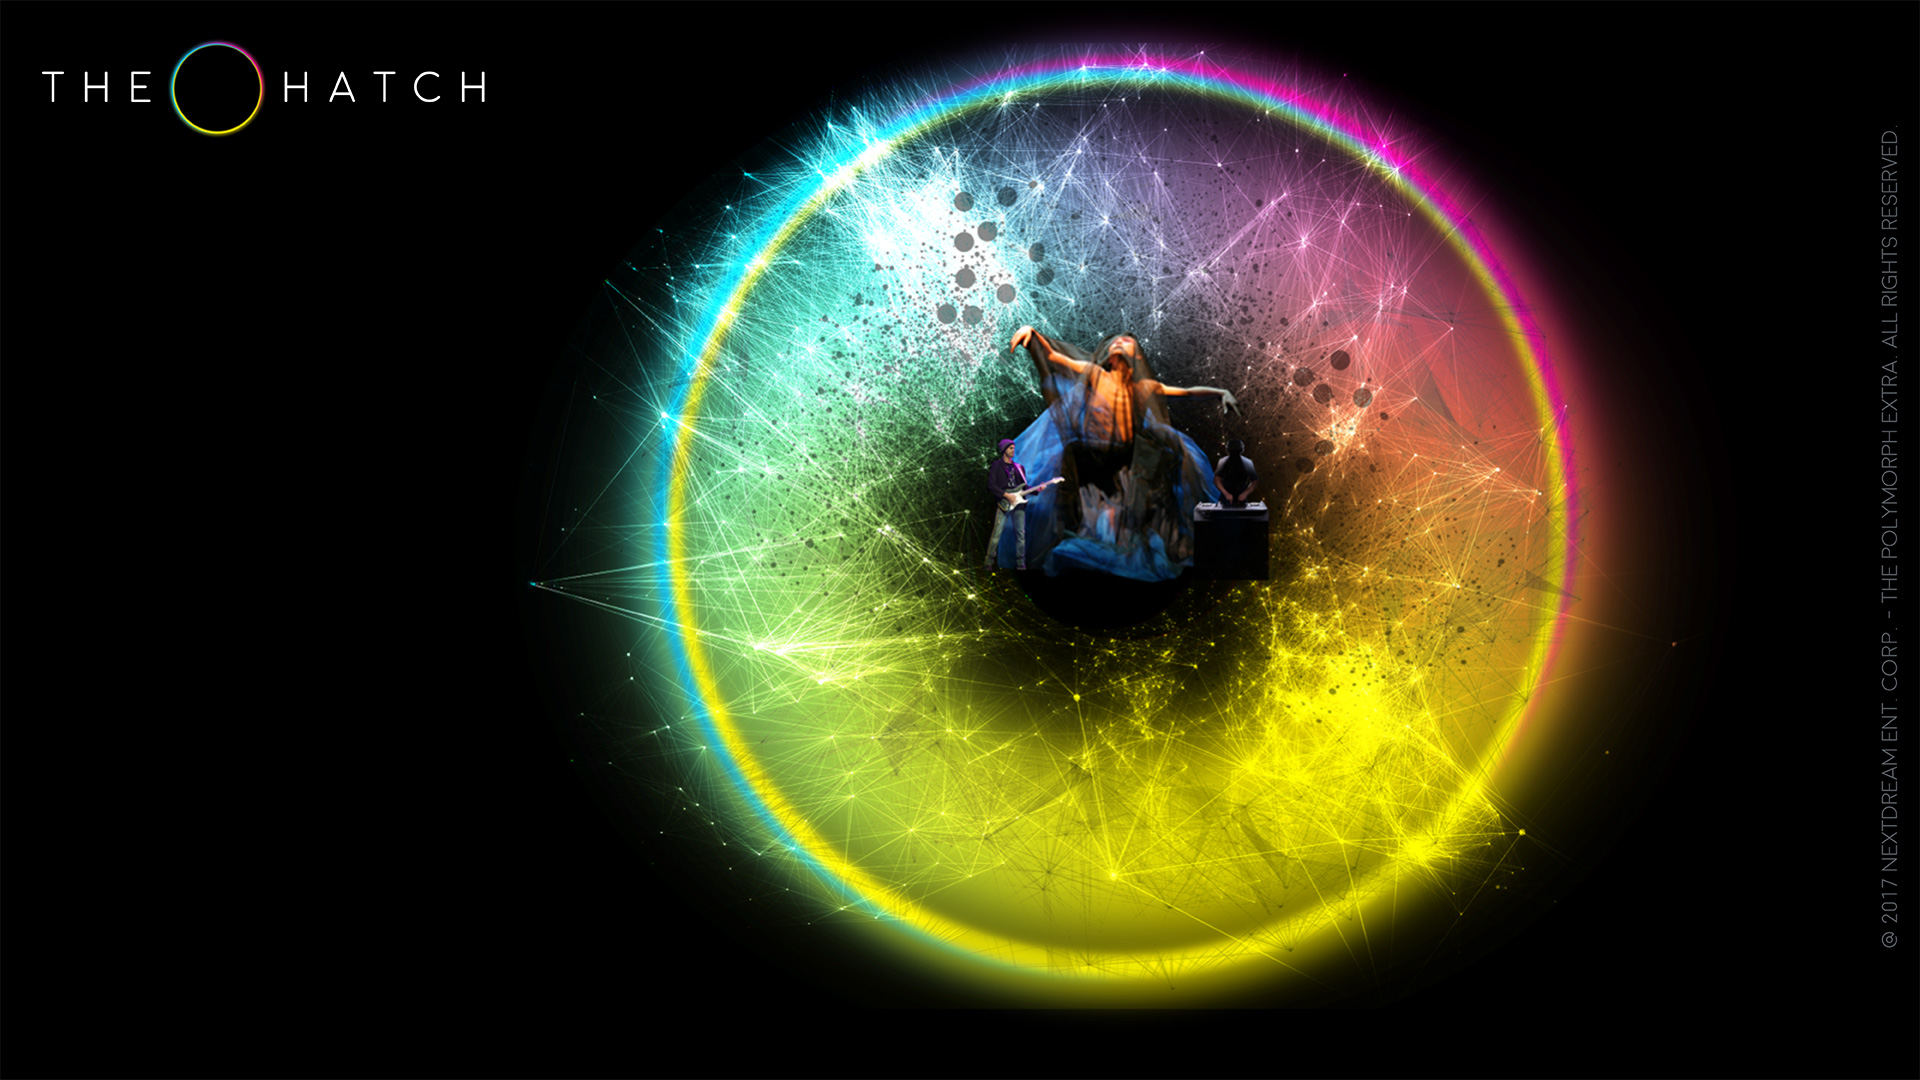 THE-HATCH-©-NEXTDREAM-ENT.-CORP.---THE-POLYMORPH-EXTRA-23.jpg